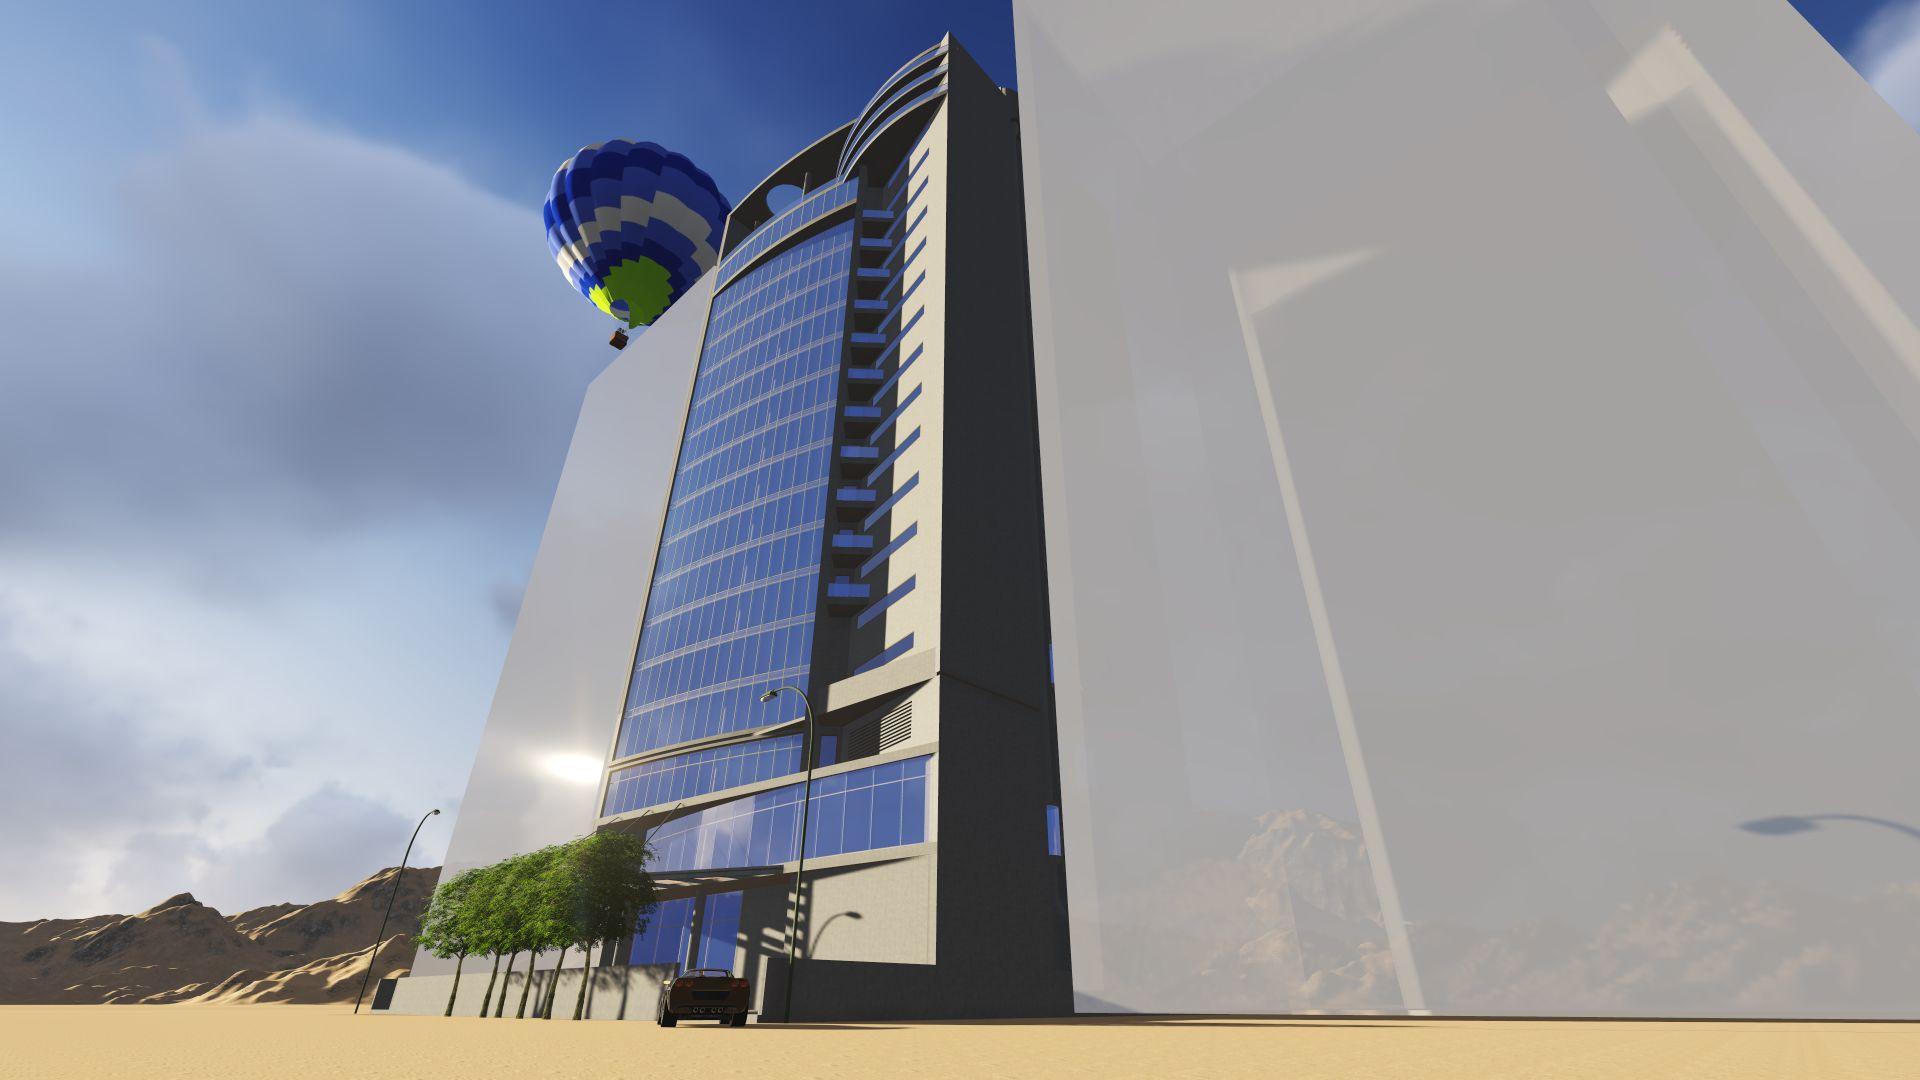 Ras al Kaiman - Tower